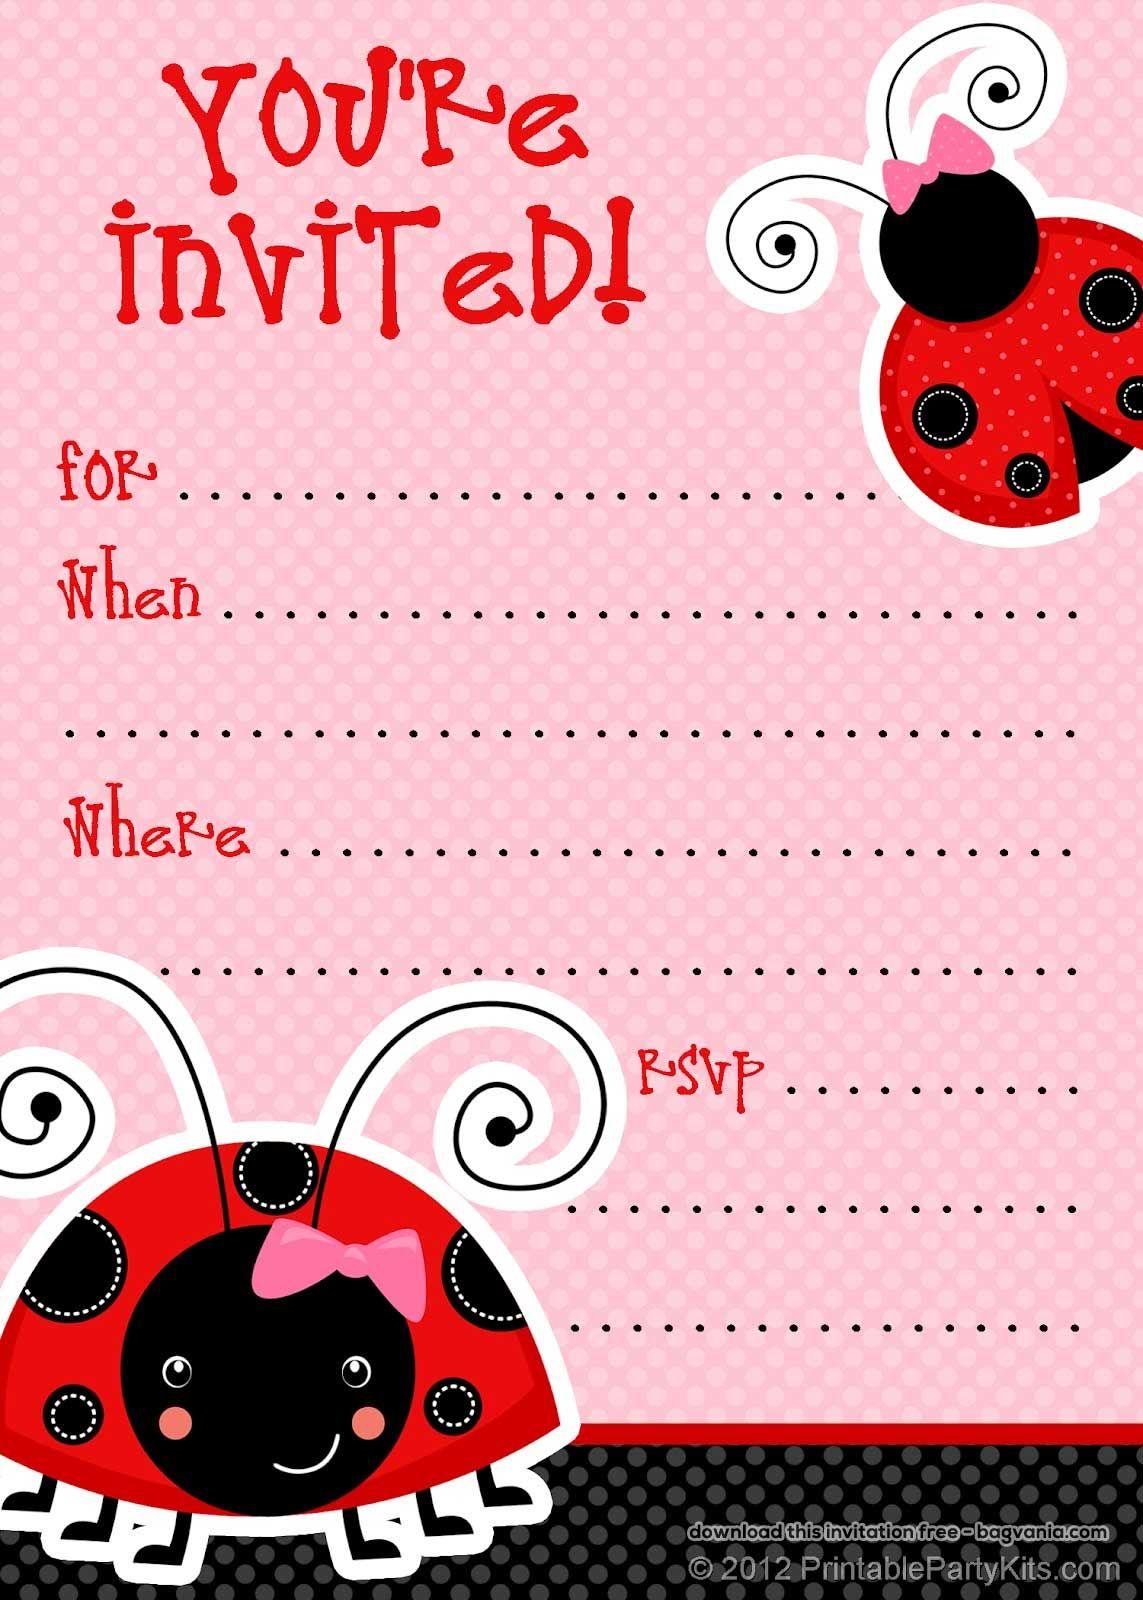 Free Ladybug Birthday Invitations   Invites   Pinterest   Ladybug ...